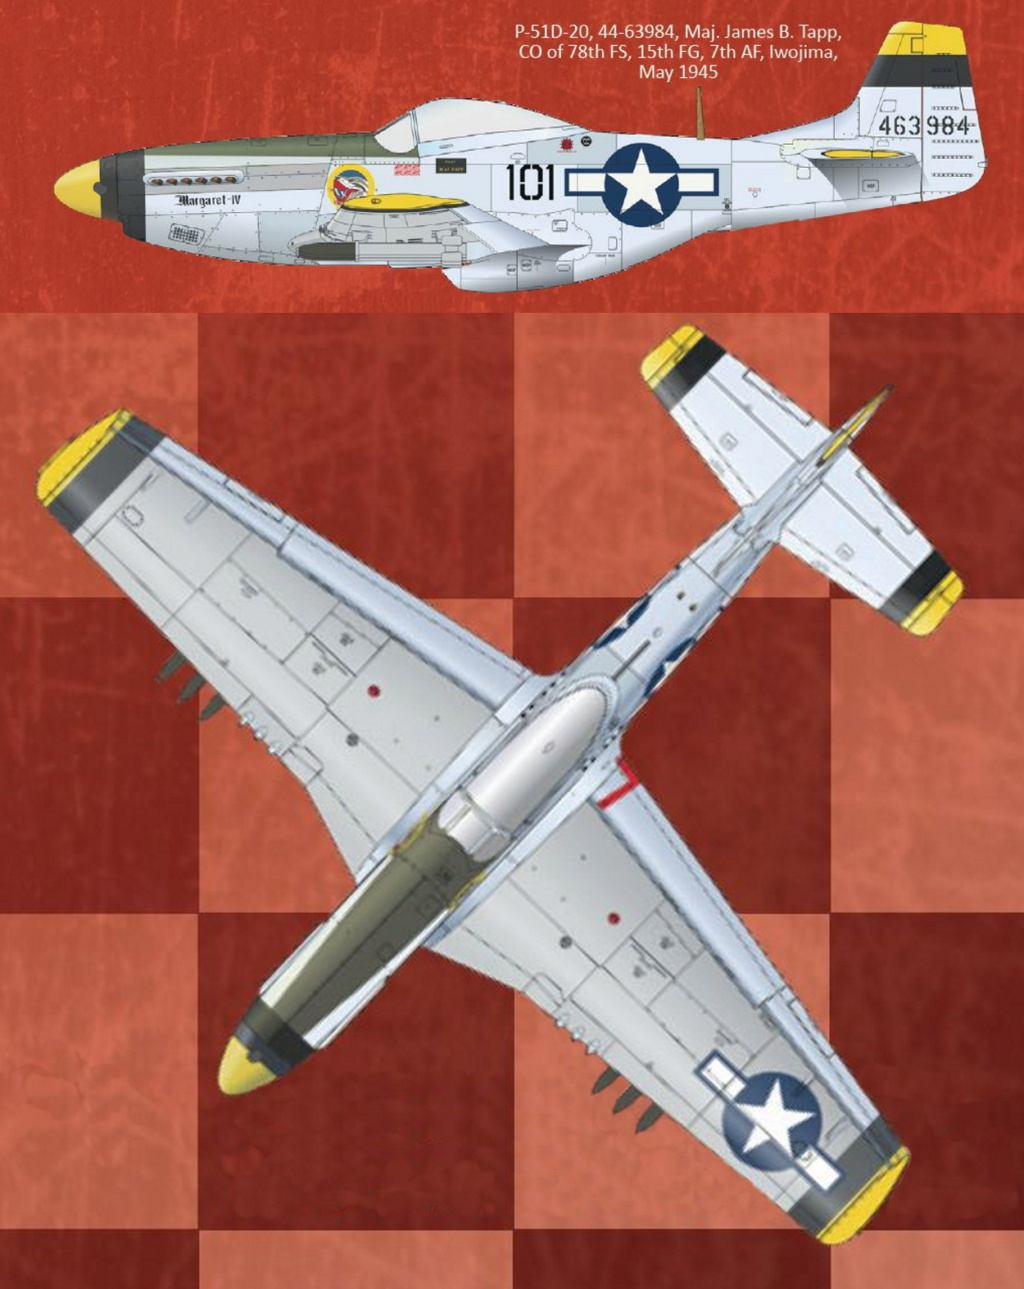 NORTH AMERICAN P-51 MUSTANG P51-5-15